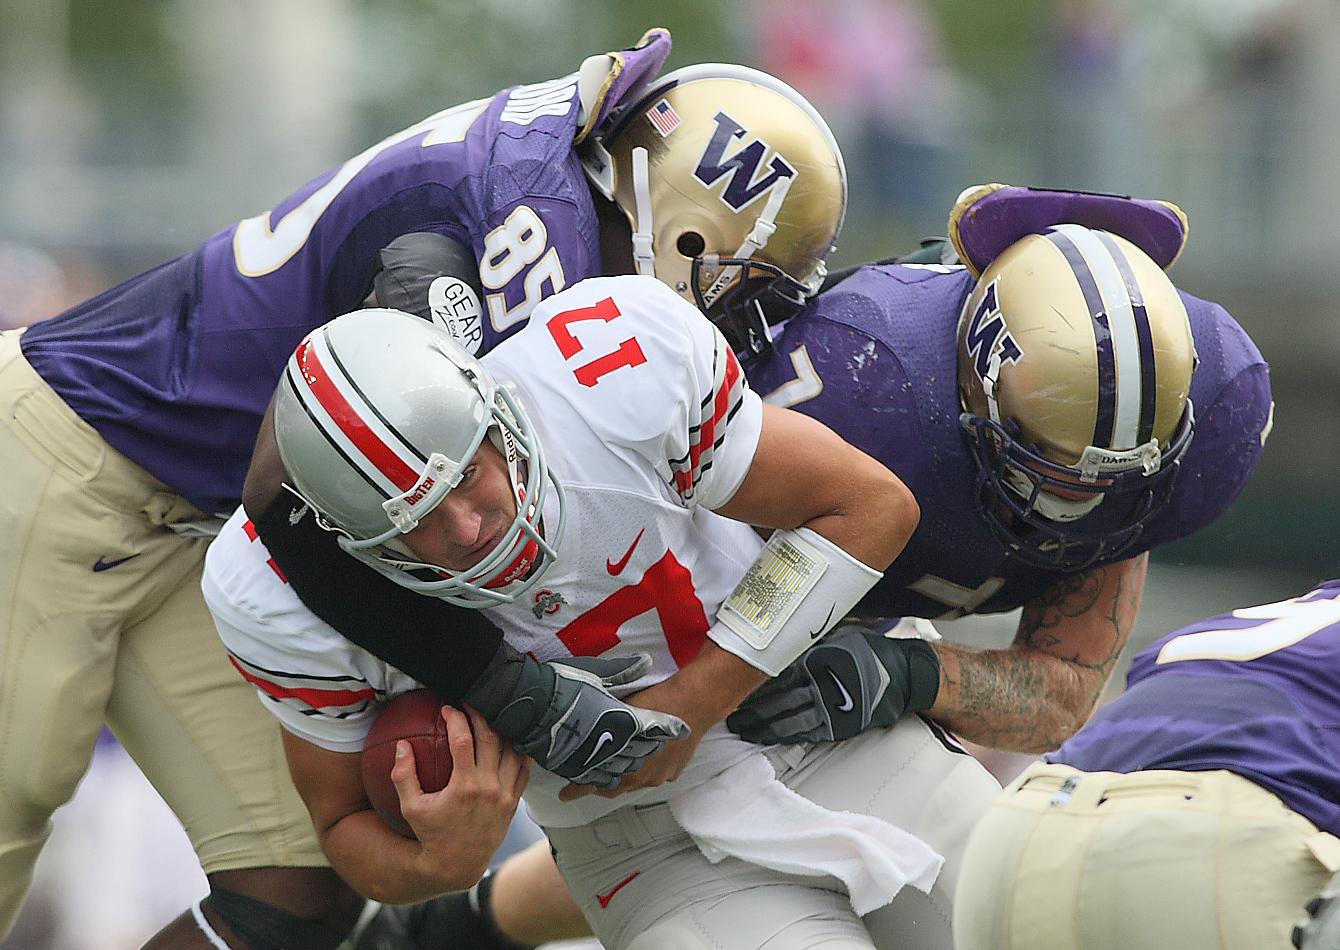 Football - NCAA - Ohio State vs. Washington Huskies